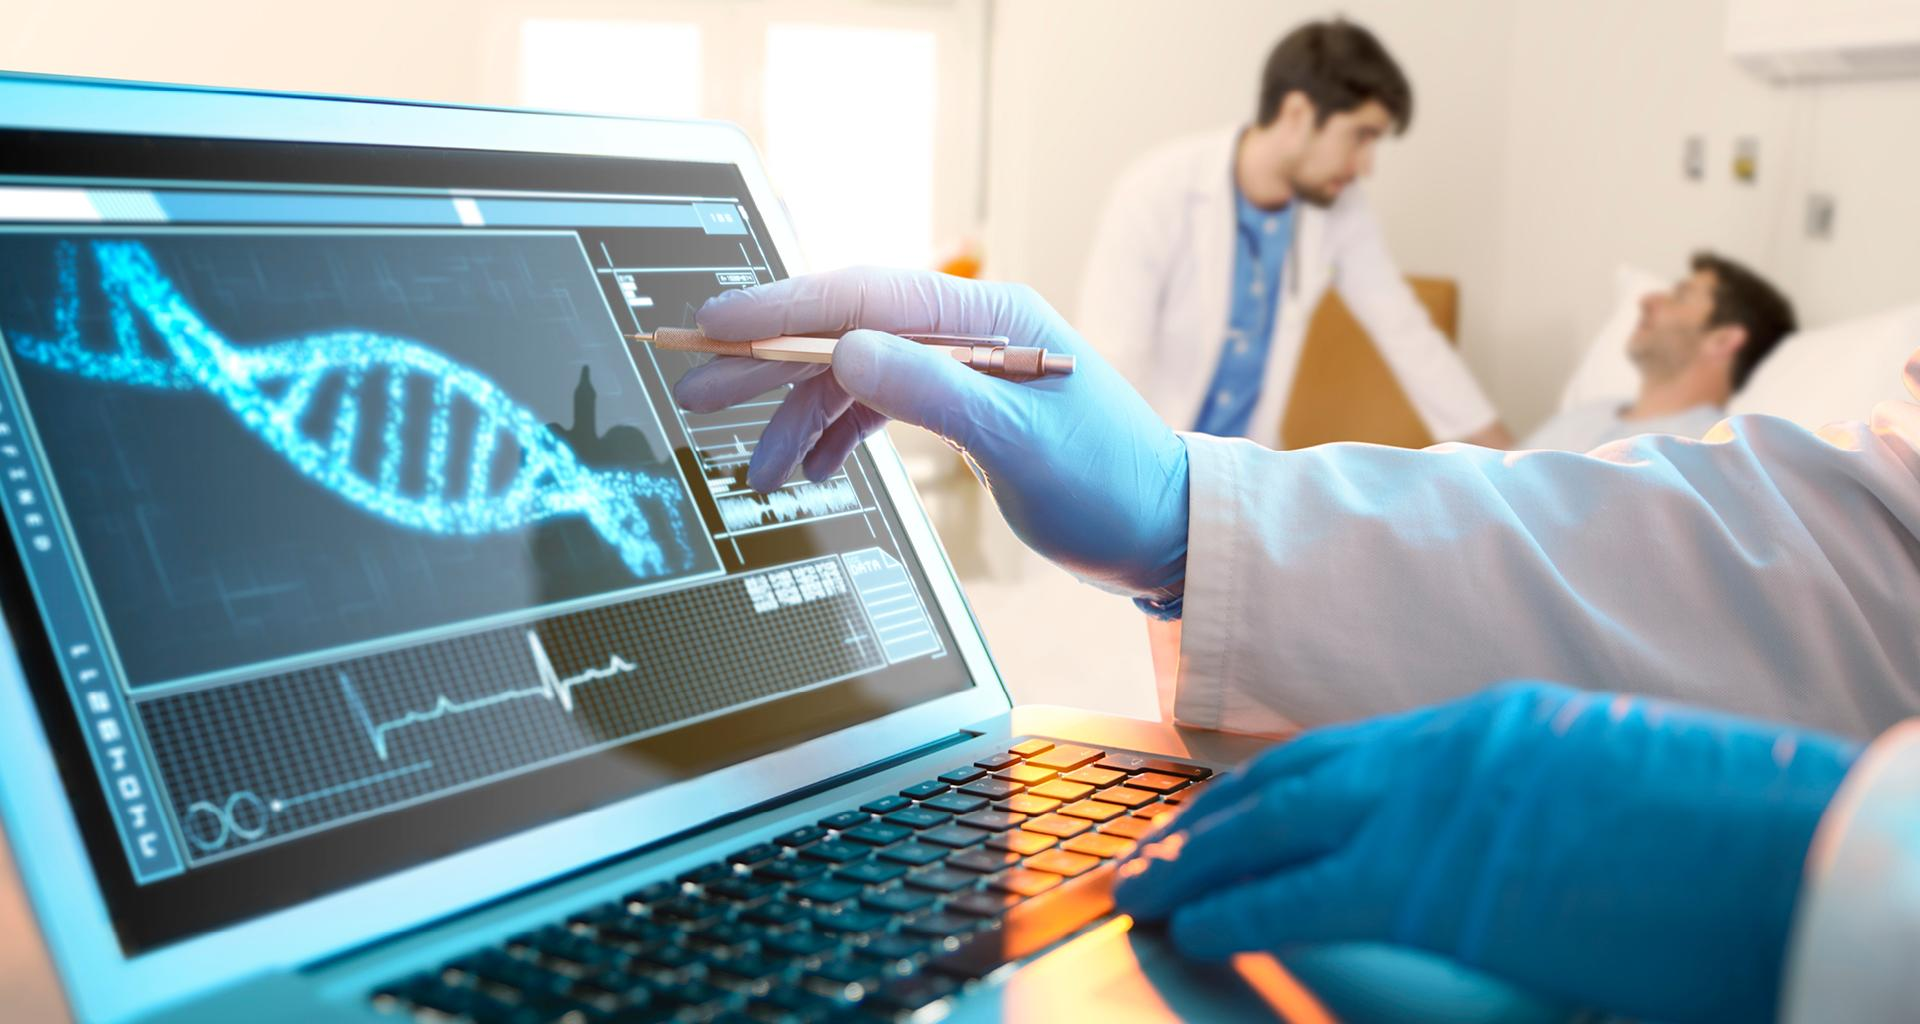 Genomics and Precision Medicine Graduate Program